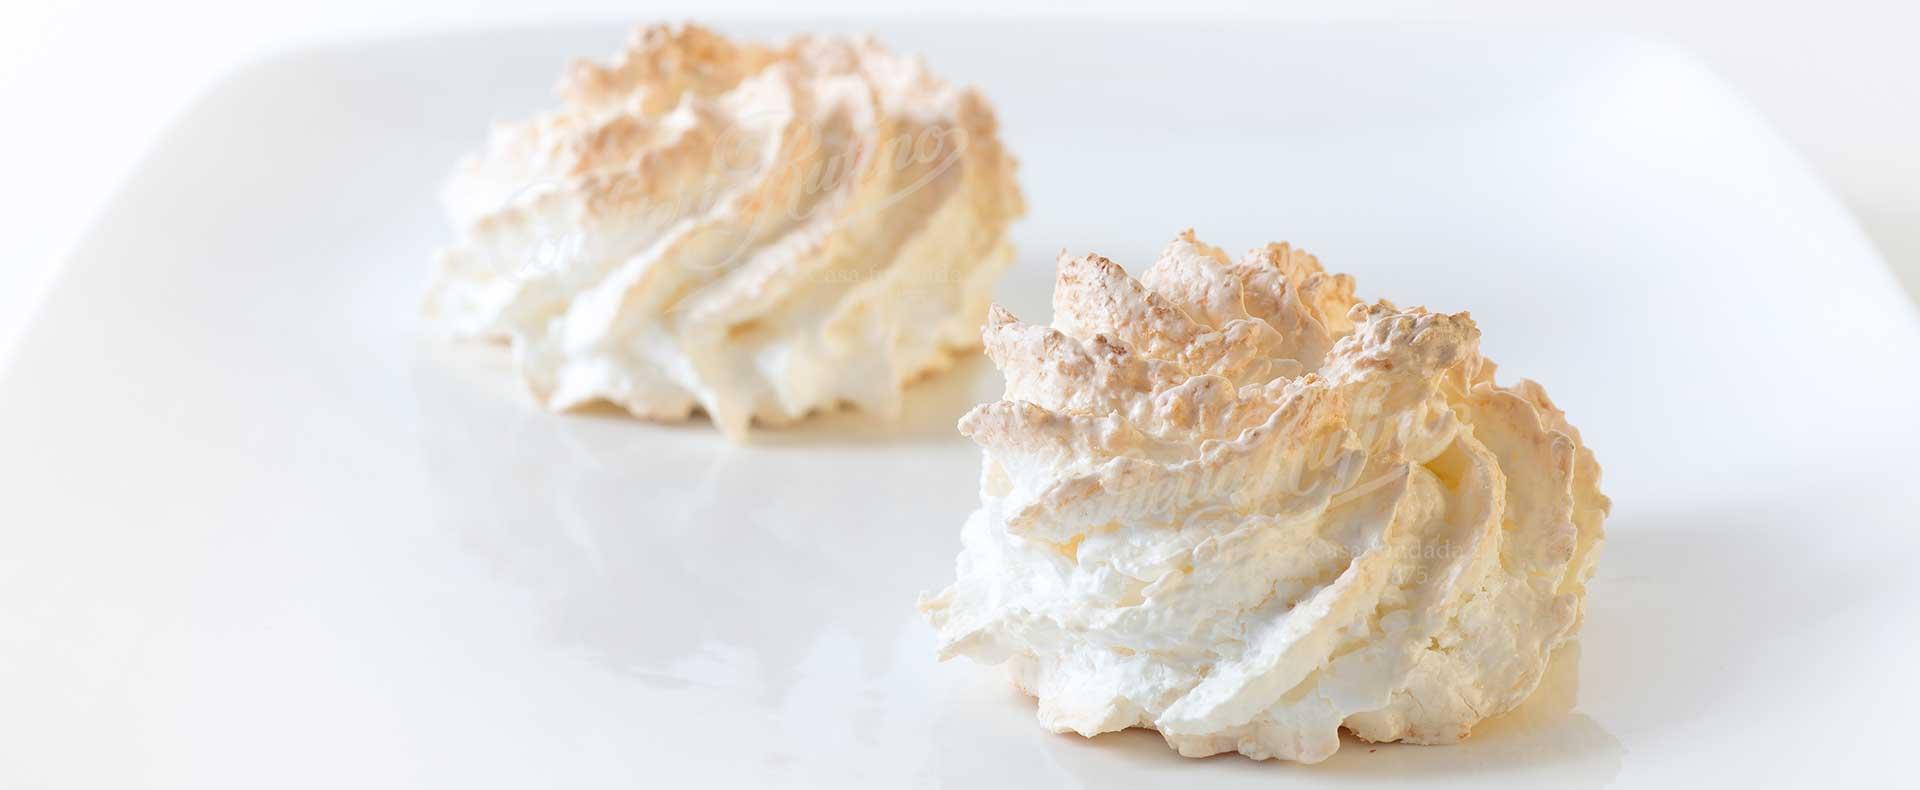 sultanas coco merengue Confiteria Rufino Aracena